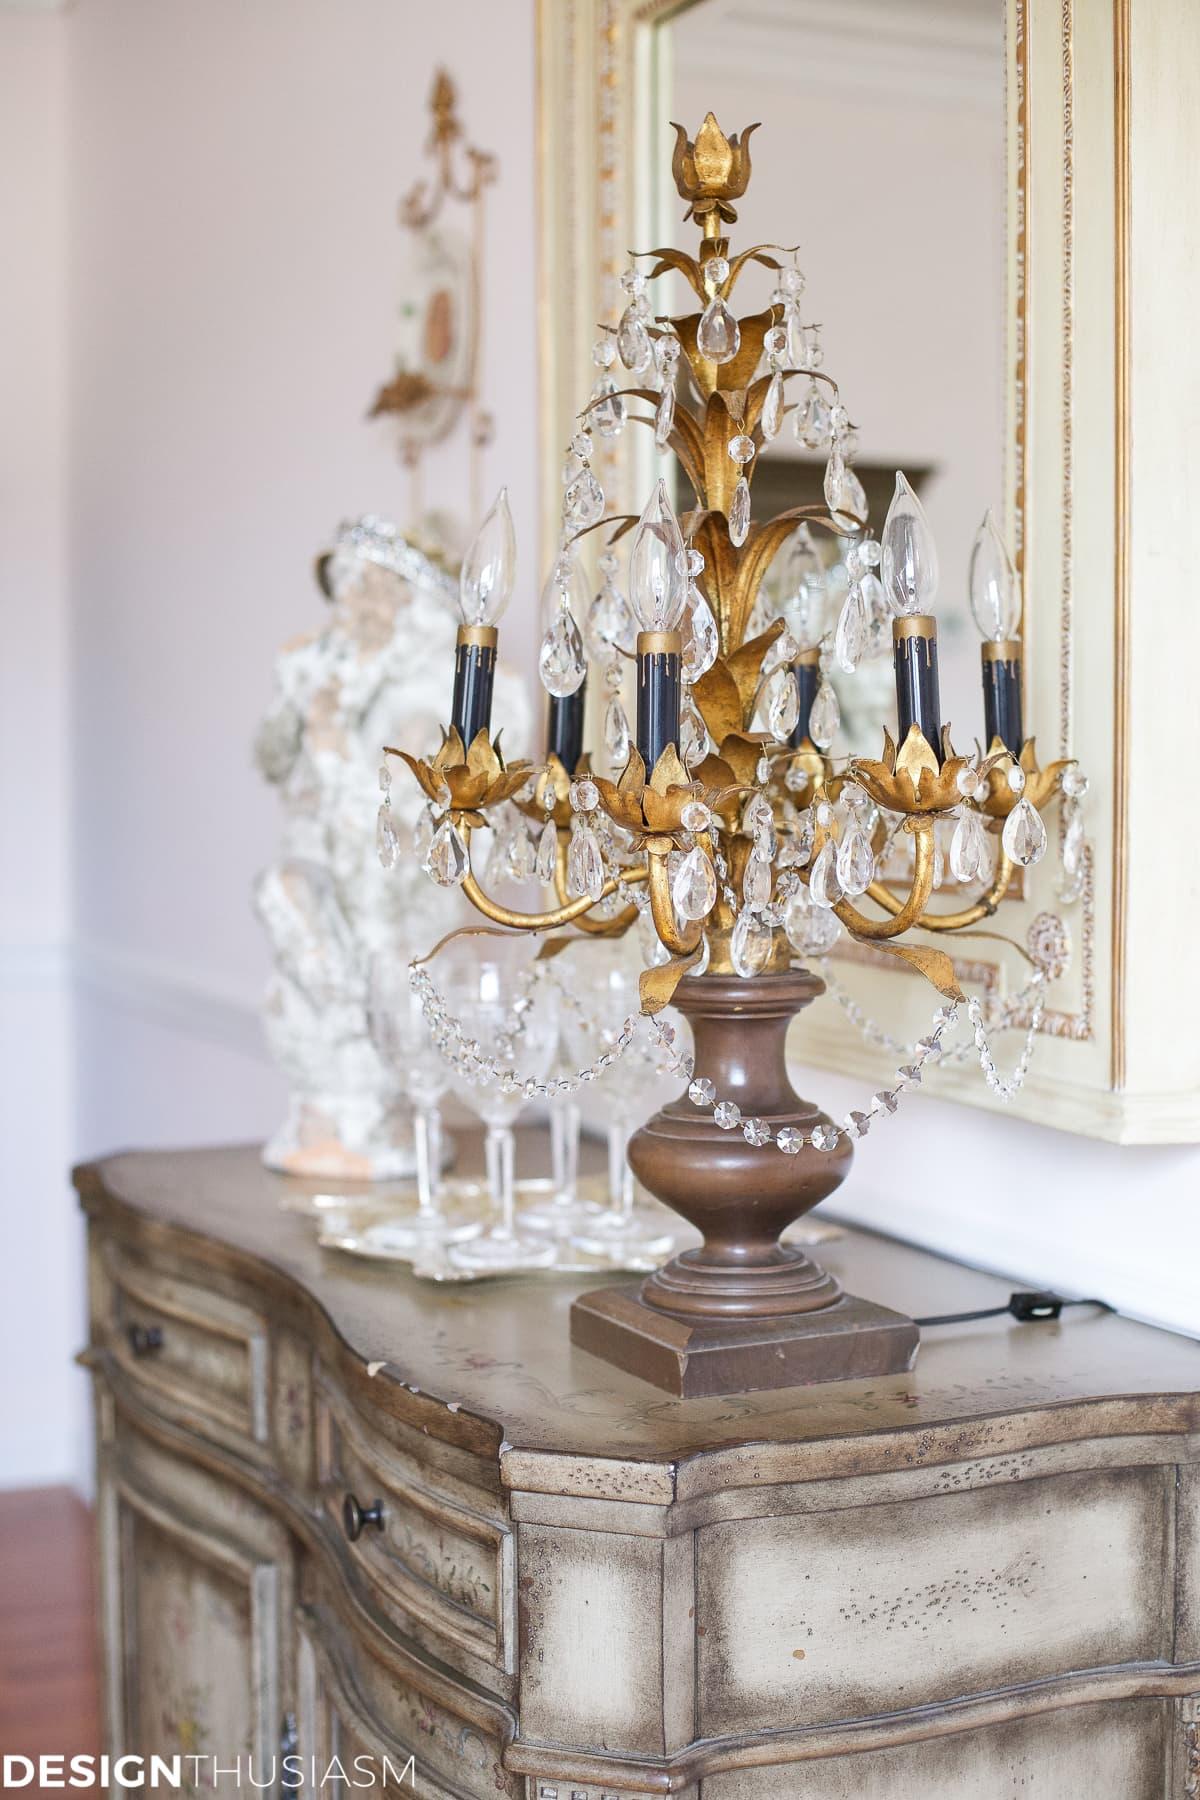 Elegant dining rooms | vintage French style sideboard | Designthusiasm.com